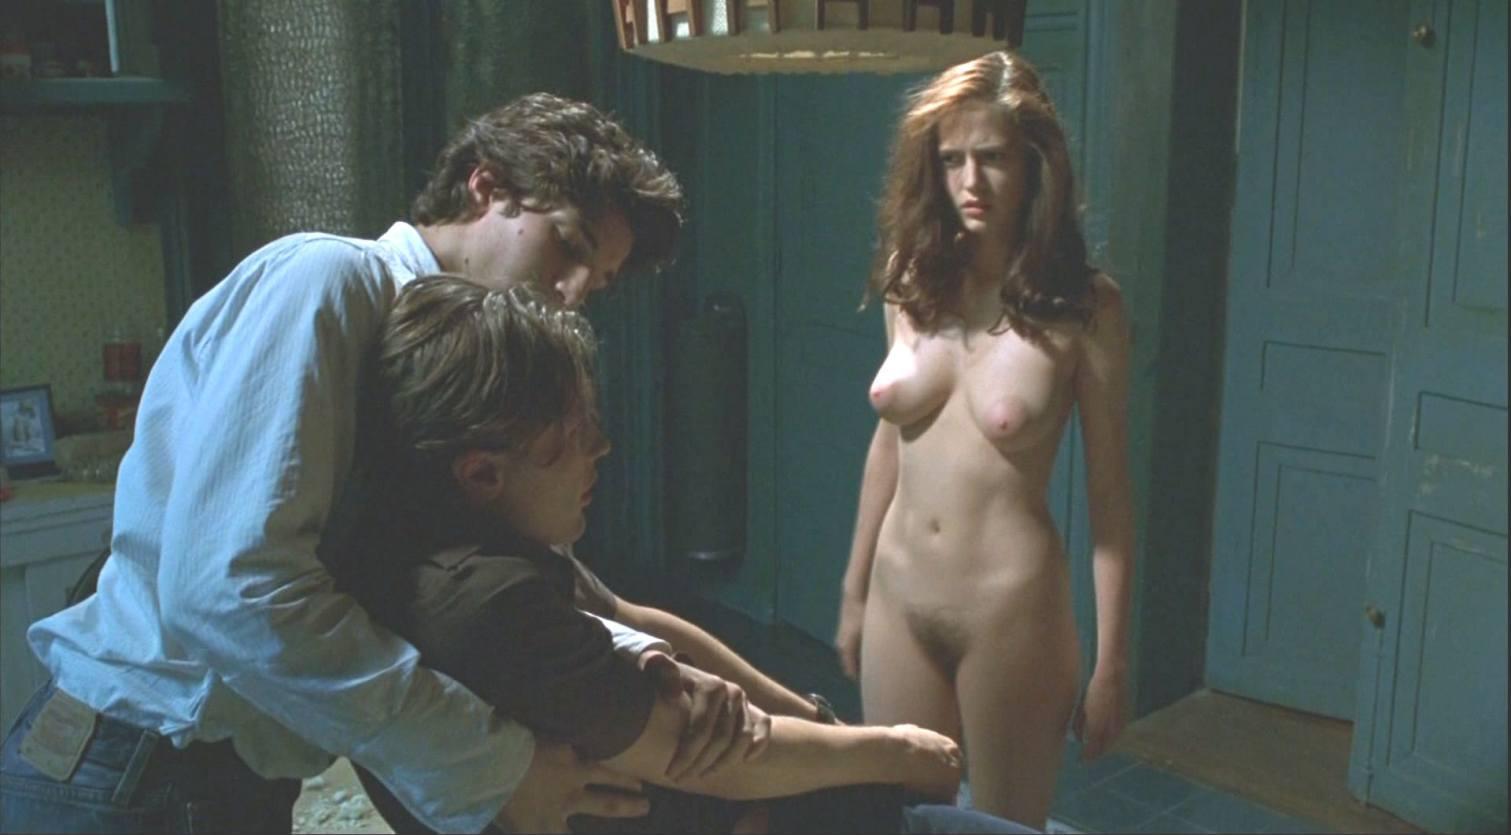 porno-soski-foto-golimi